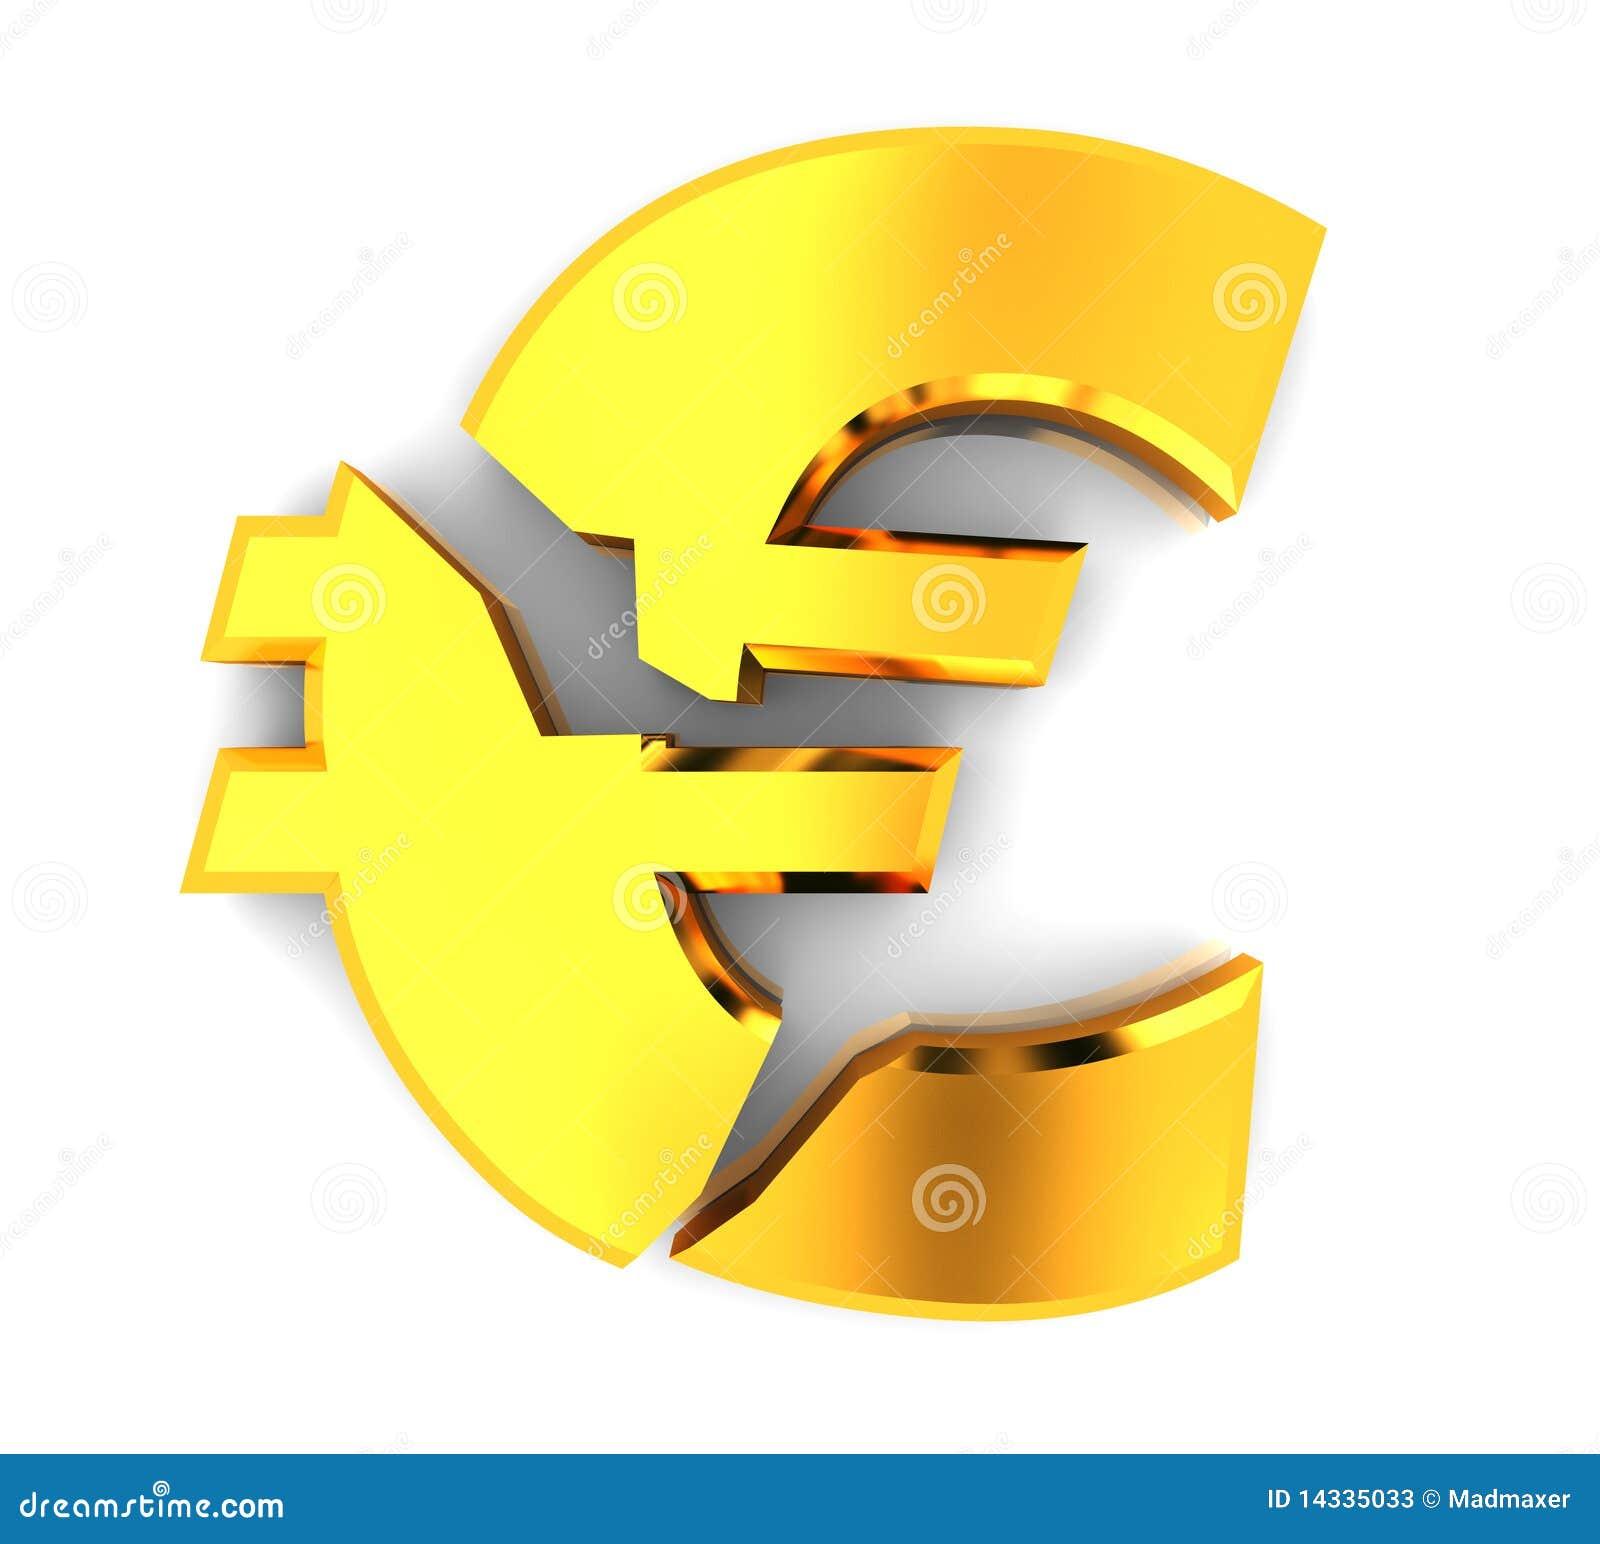 Broken euro